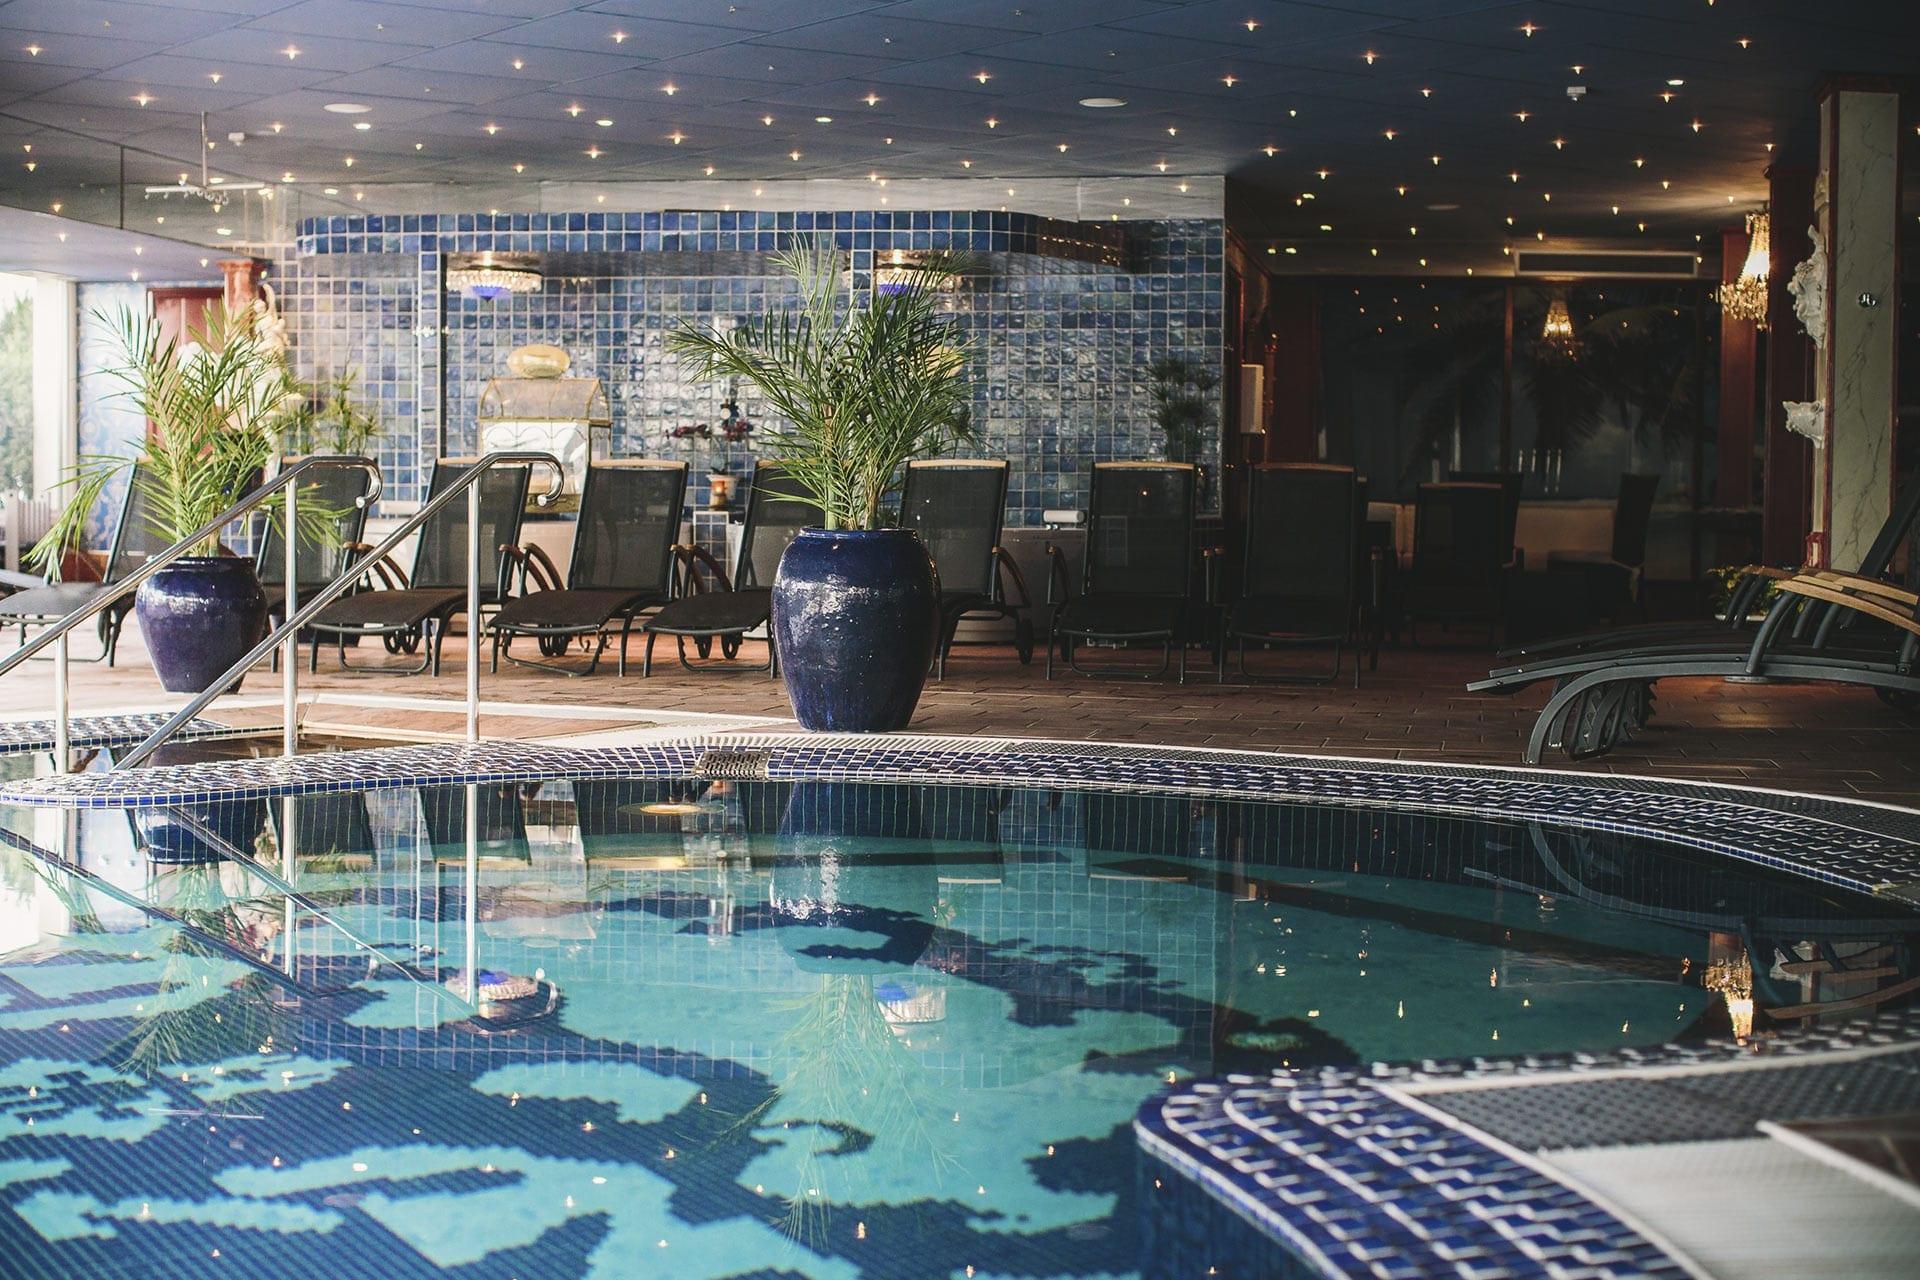 hotell stockholm billigt bra